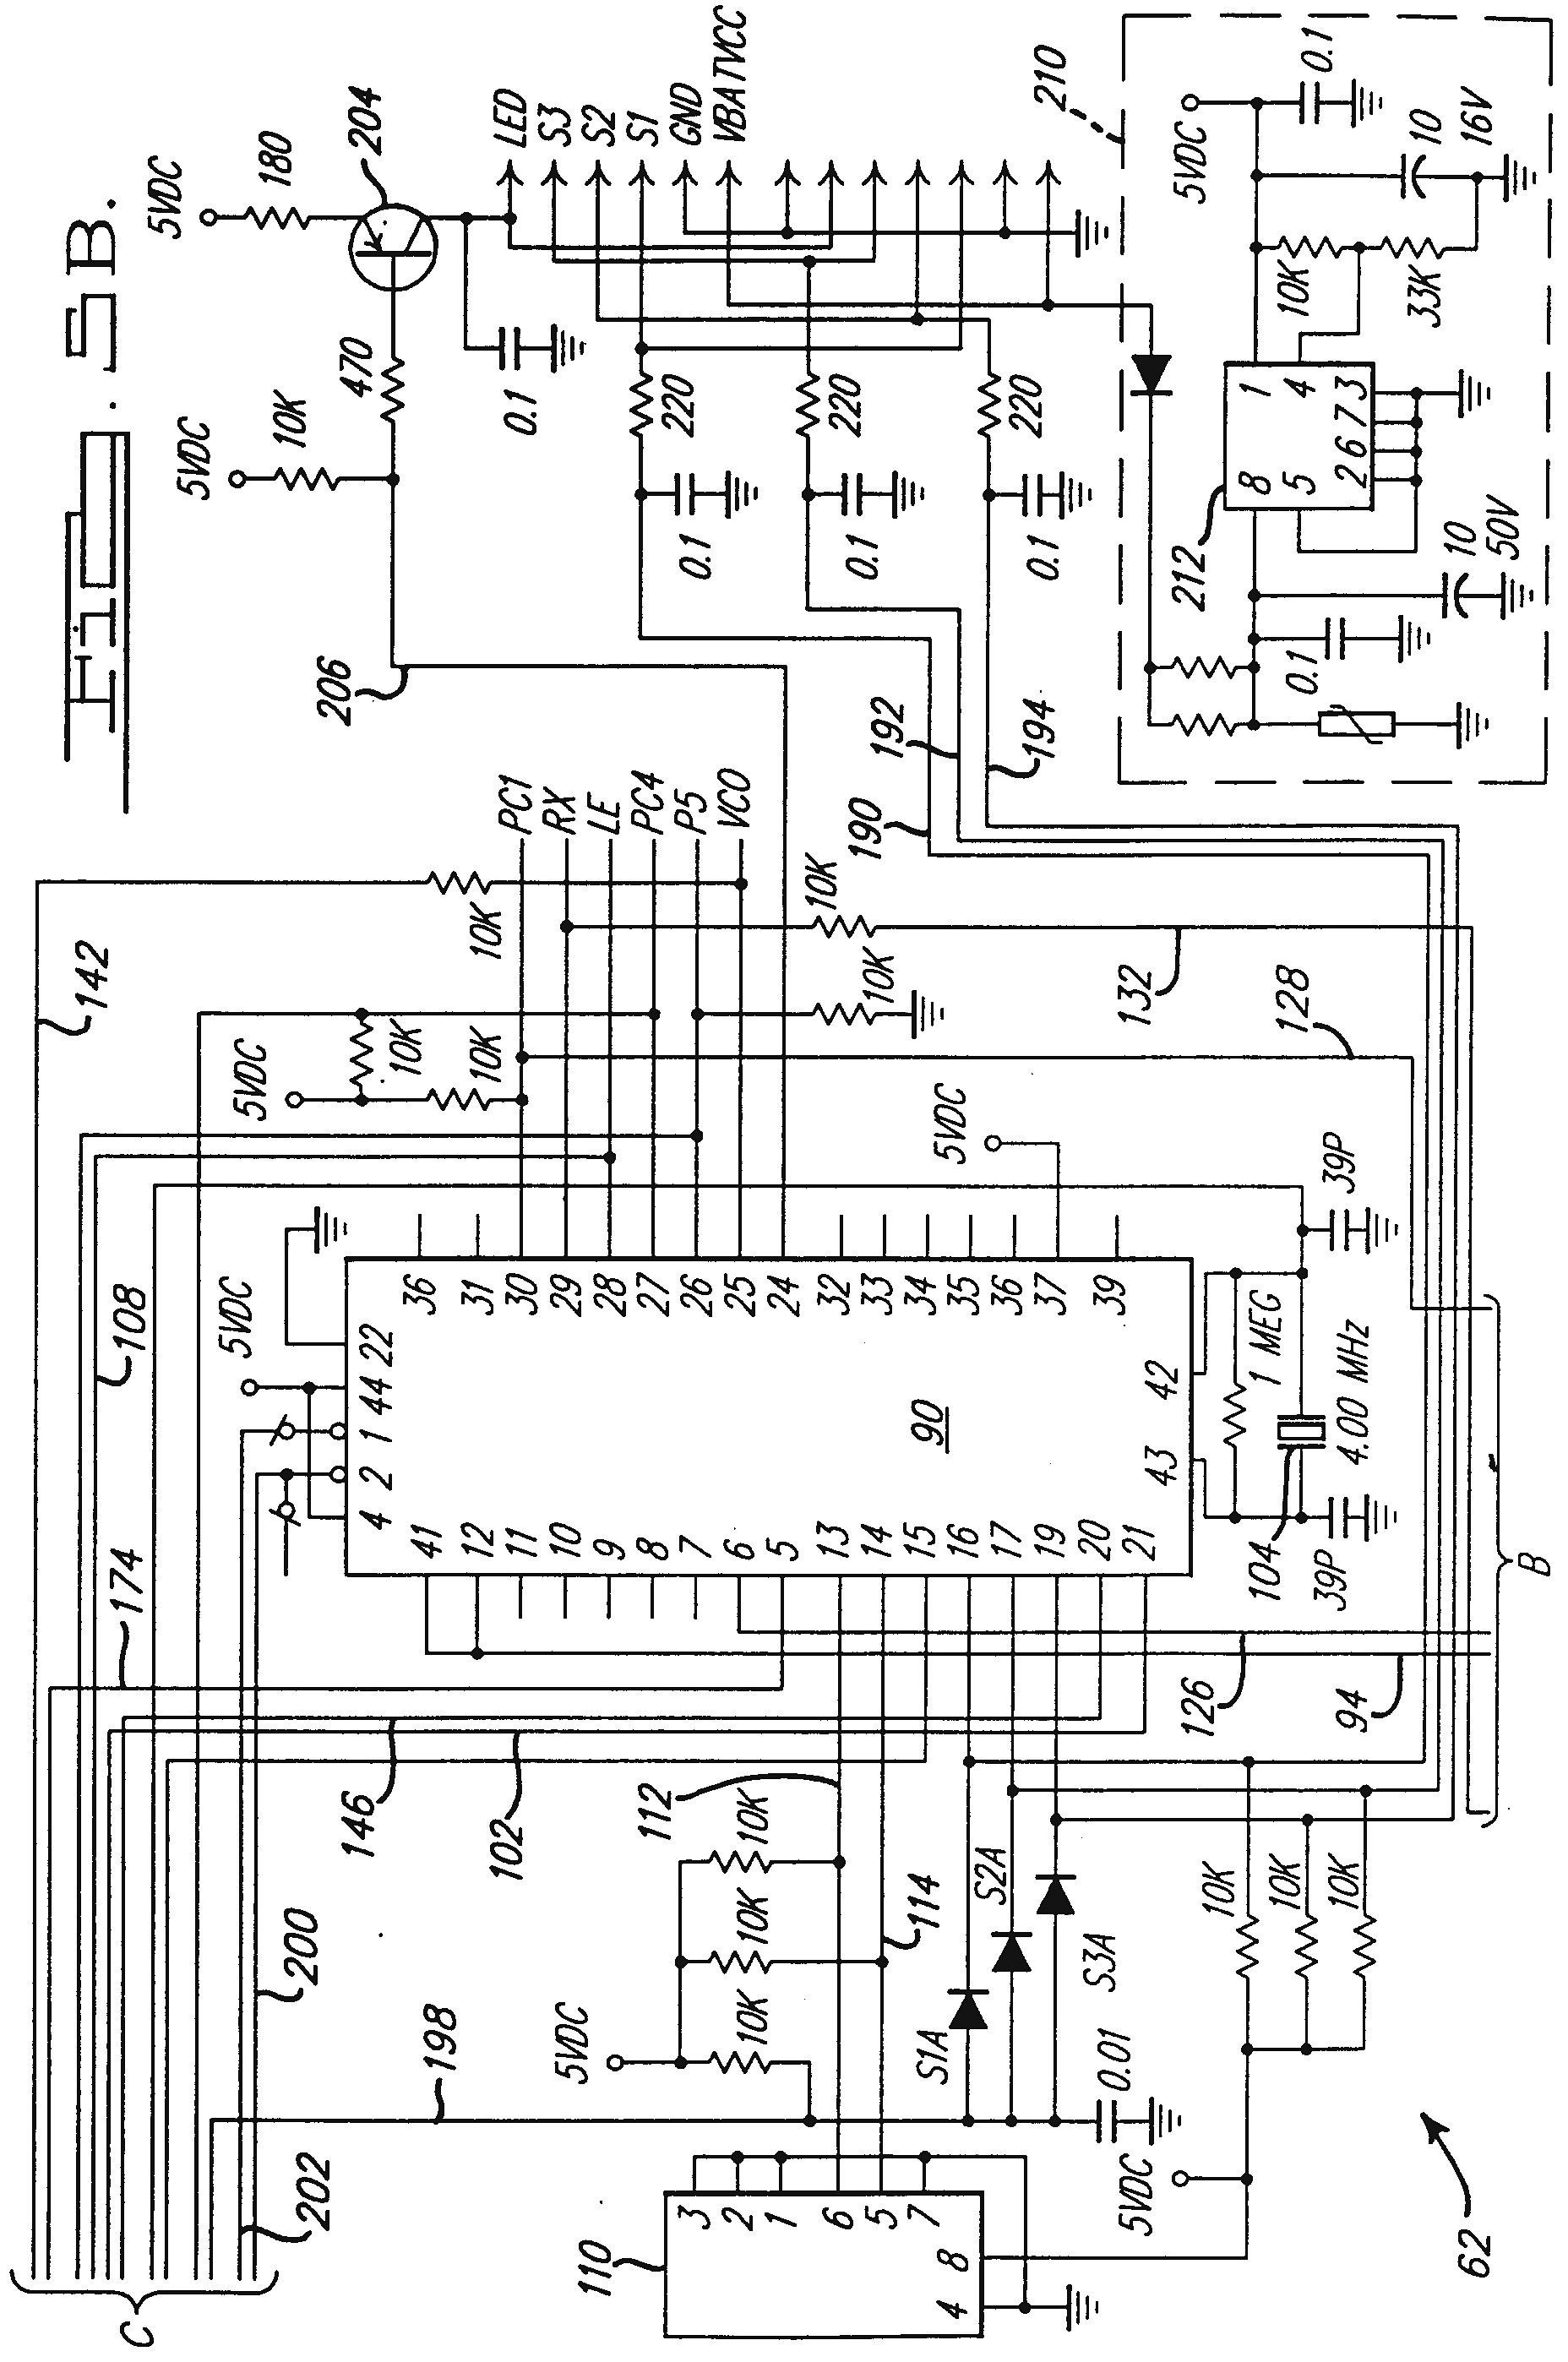 Liftmaster Wiring Diagram